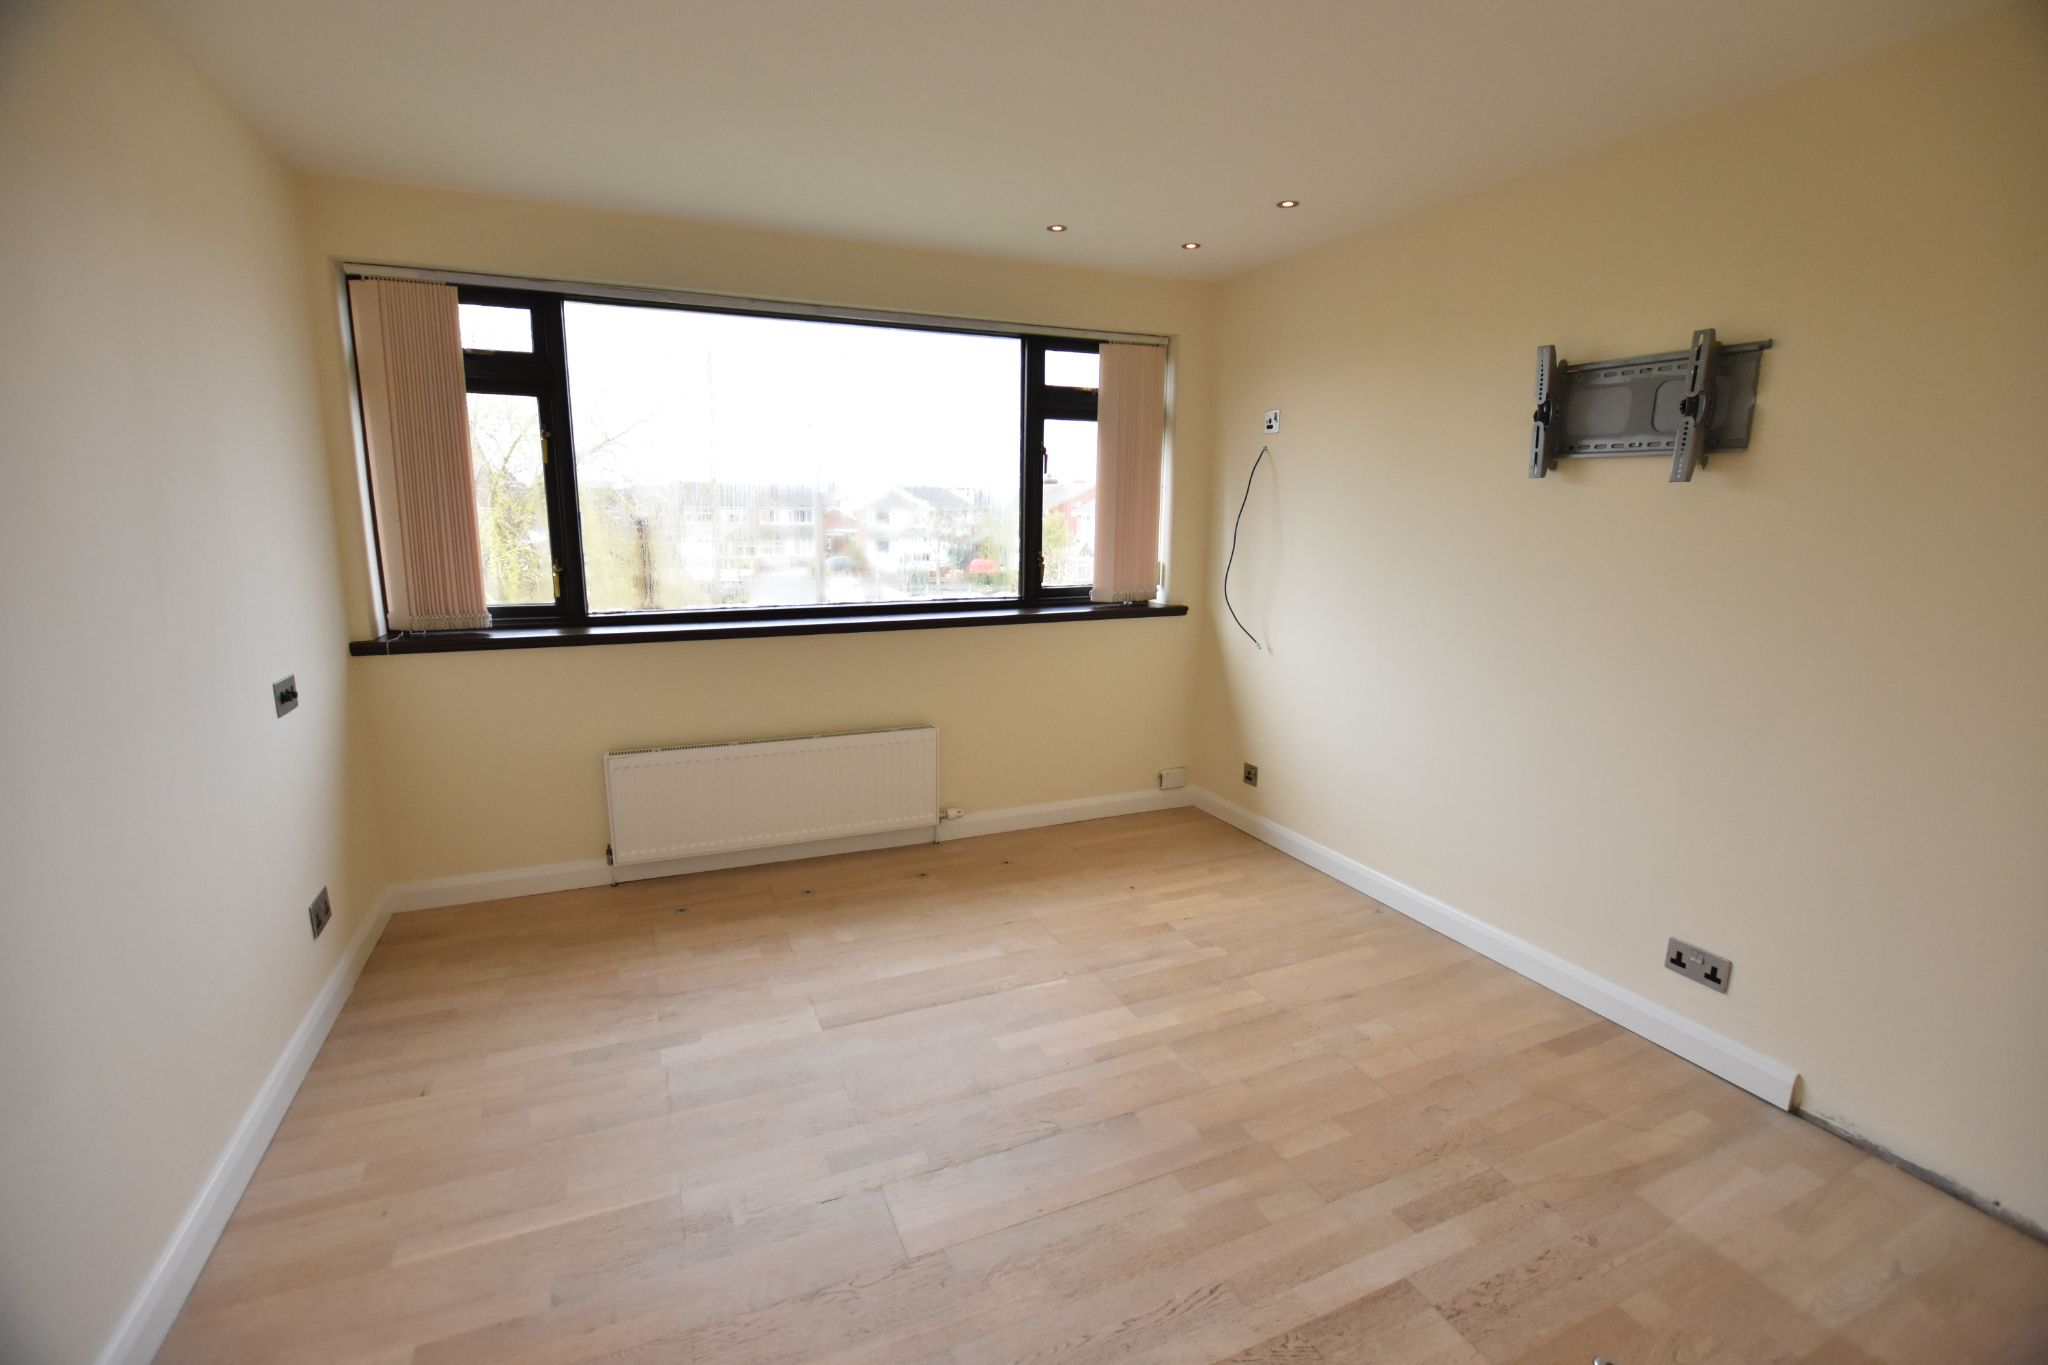 3 bedroom semi-detached house For Sale in Preston - Bedroom 1